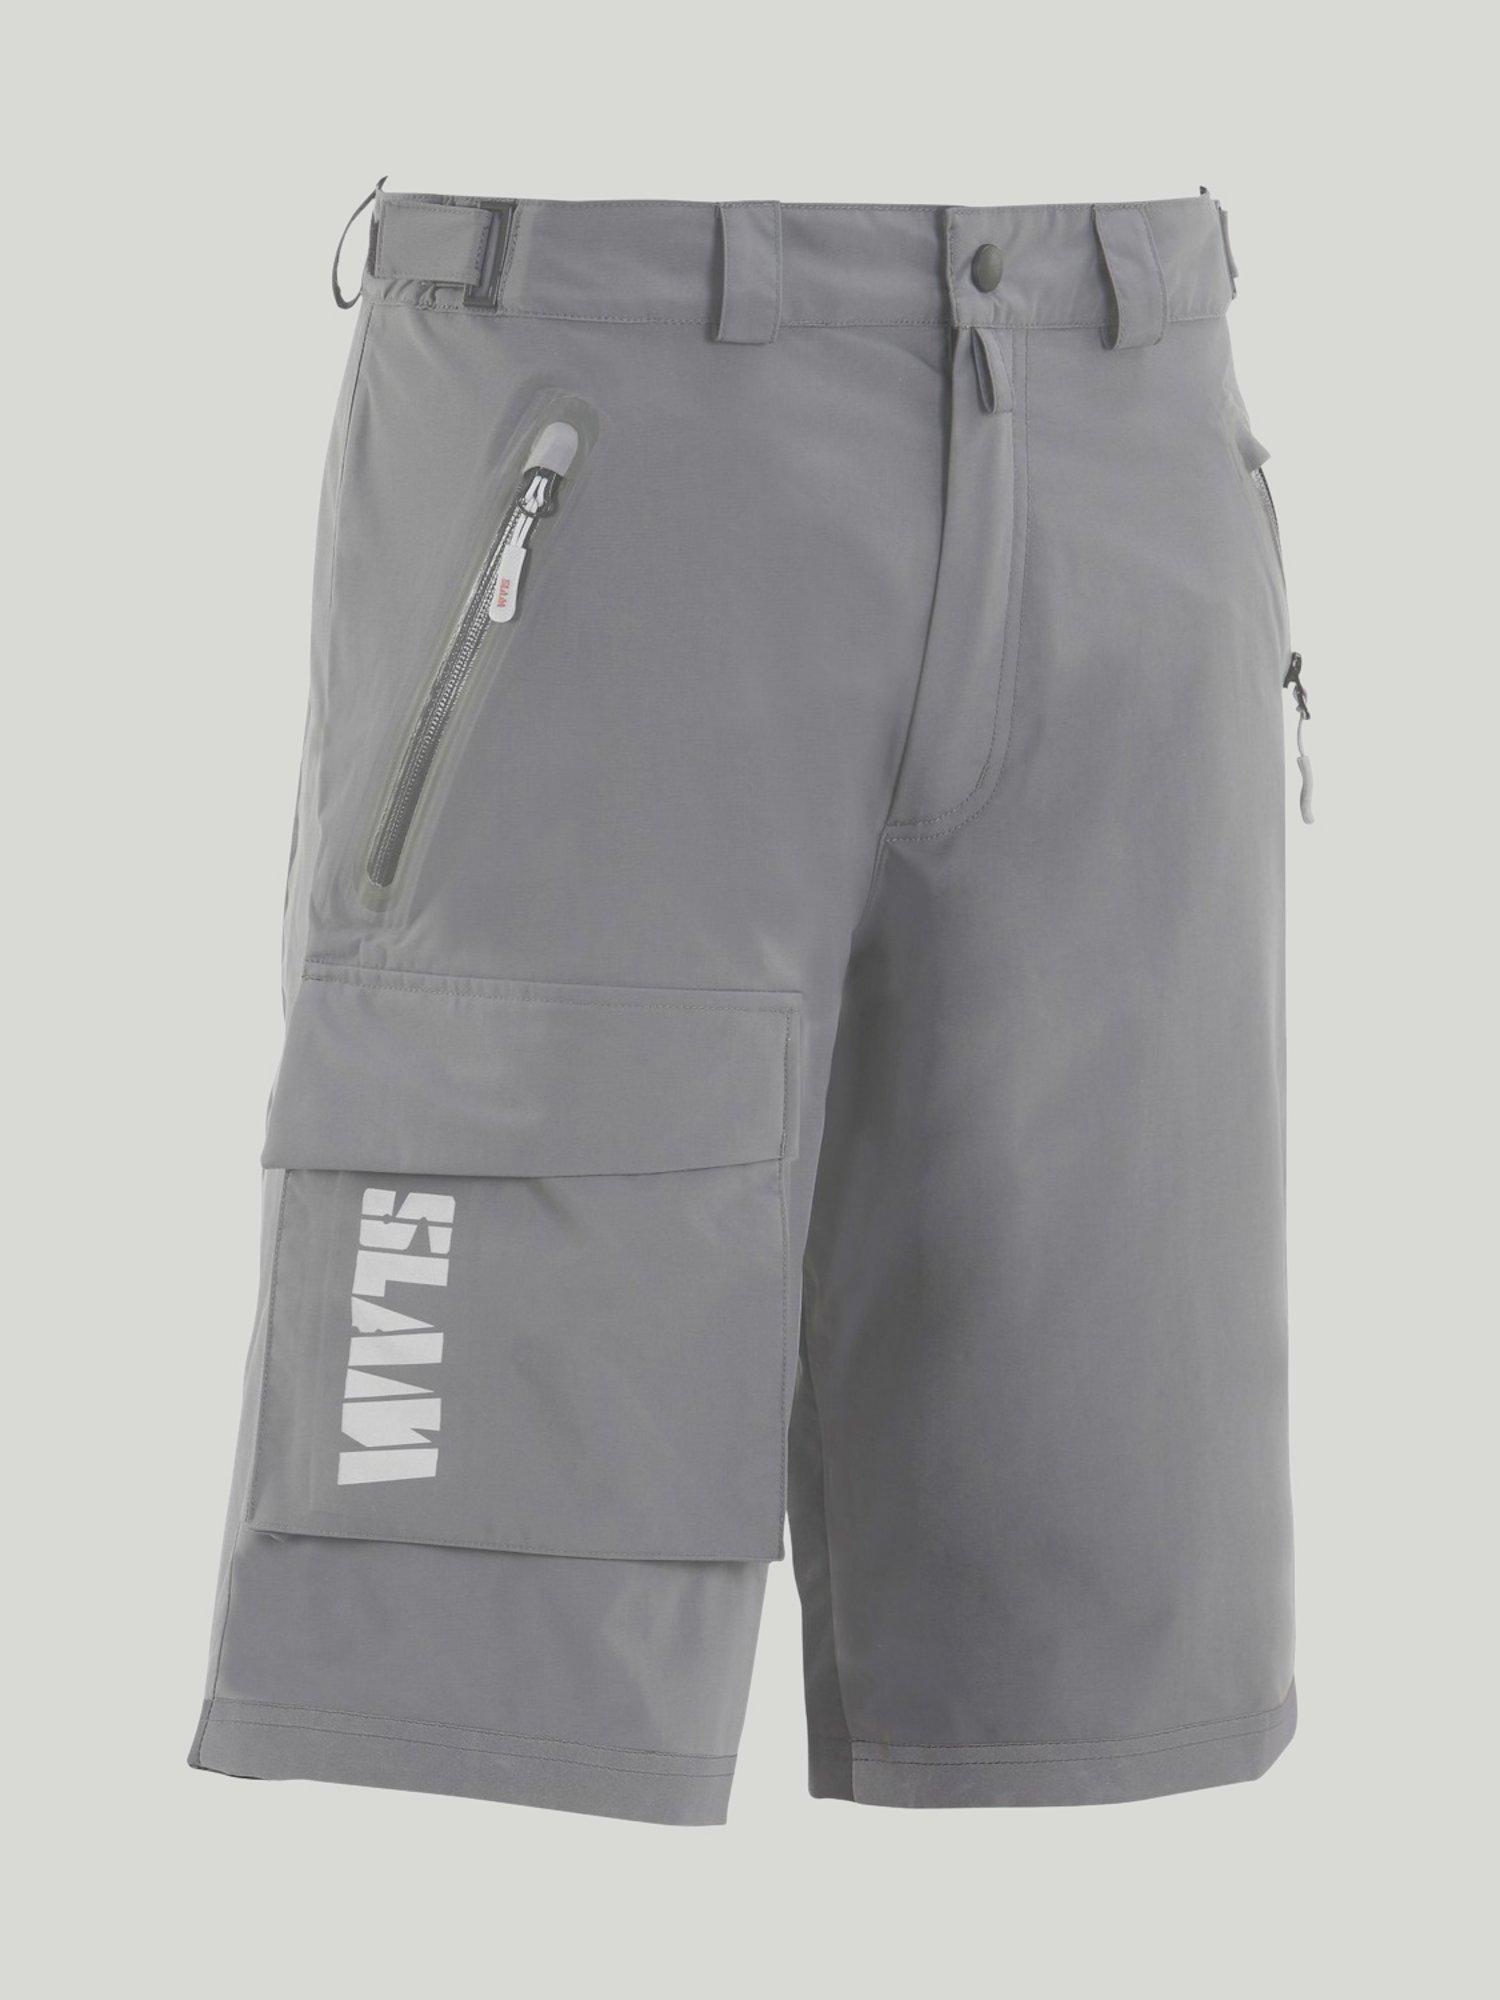 Shorts Force 2 - Grau